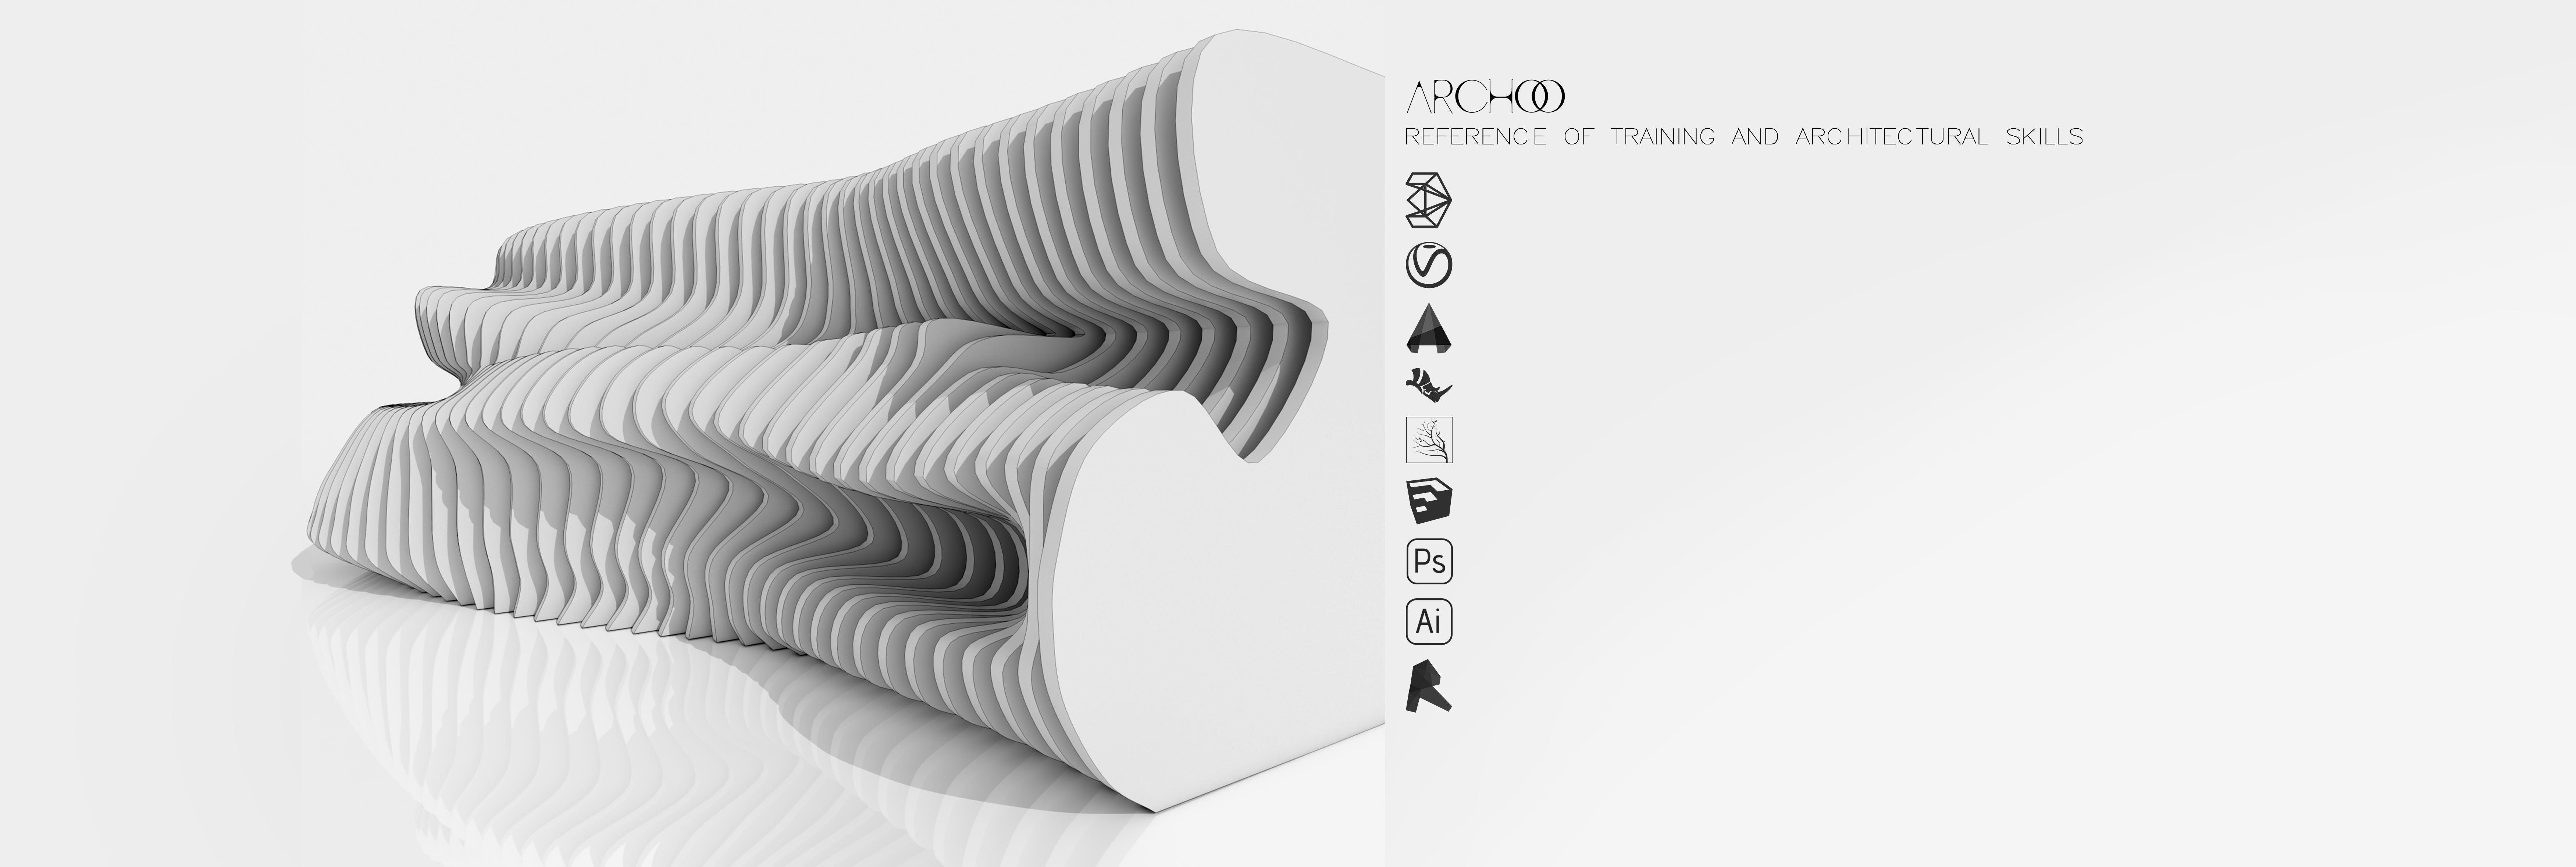 archoo web site cover